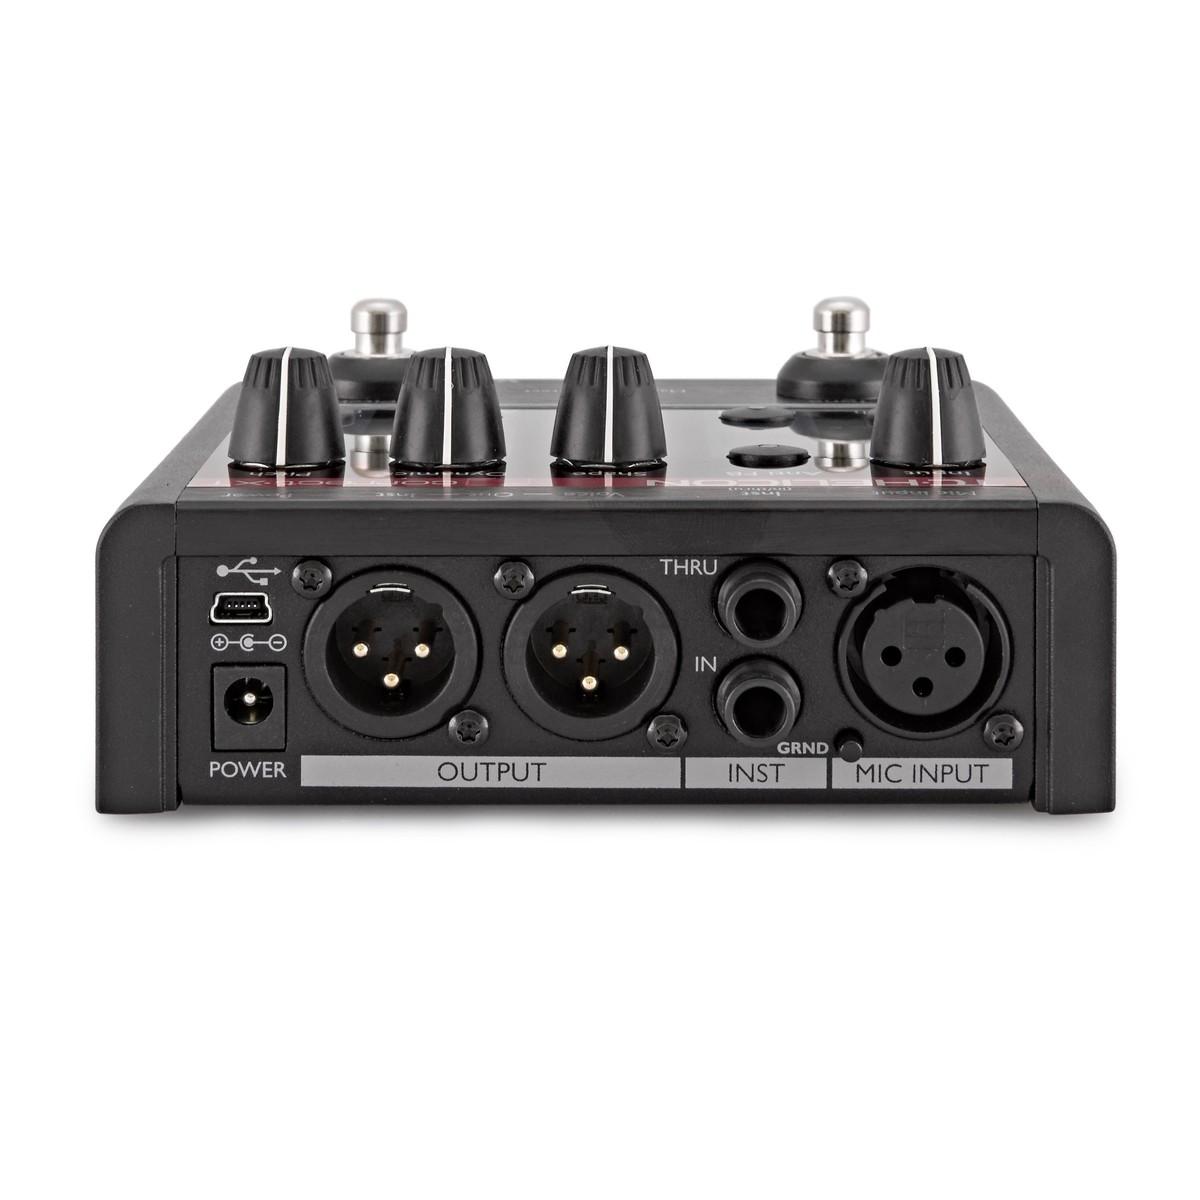 tc helicon voicetone correct xt vocal processor at gear4music. Black Bedroom Furniture Sets. Home Design Ideas